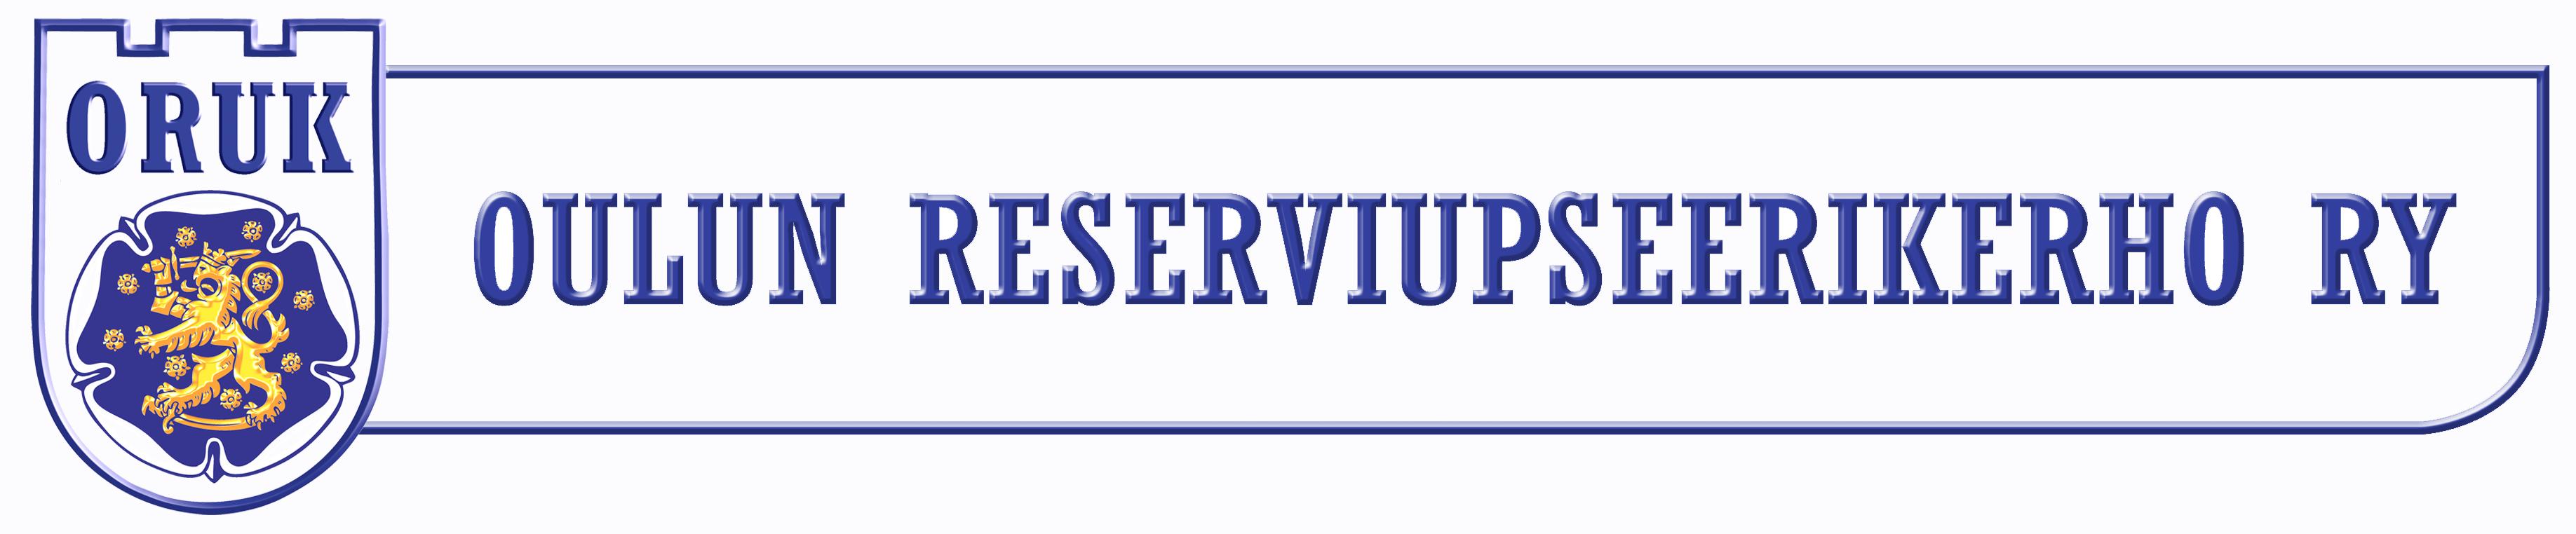 Oulun Reserviupseerikerho